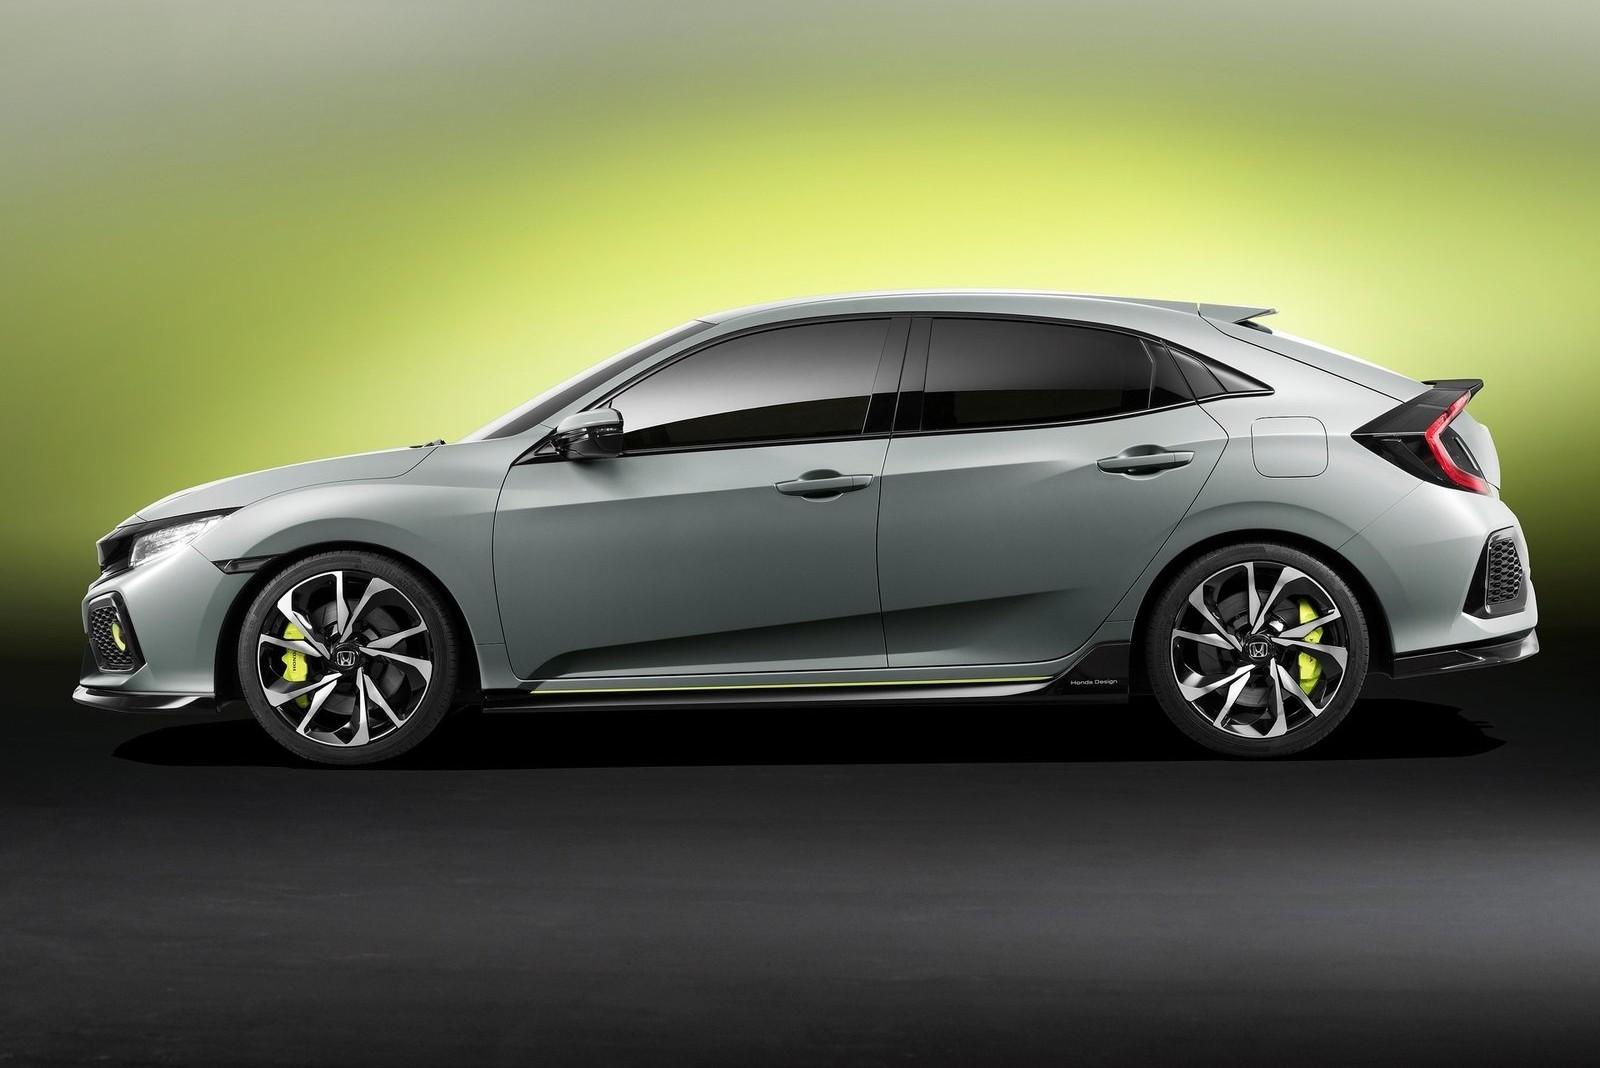 2017 honda civic hatchback prototype 2017 2018 best car reviews 2017 2017 2018 best cars reviews. Black Bedroom Furniture Sets. Home Design Ideas